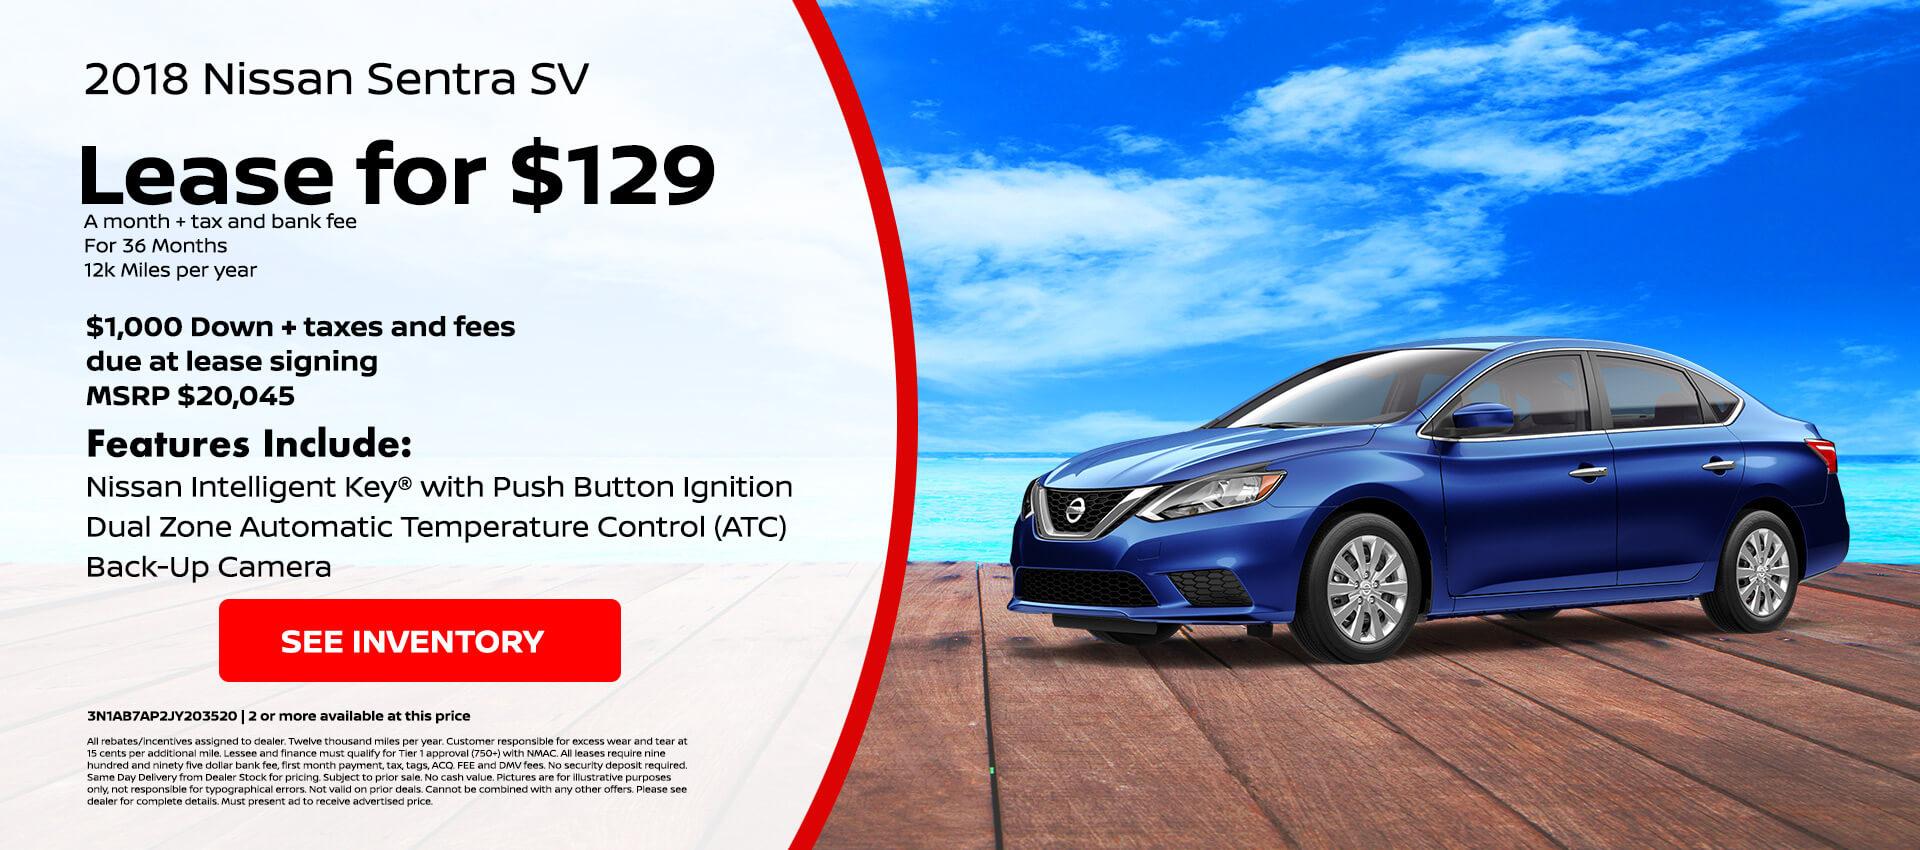 Nissan Sentra $129 Lease